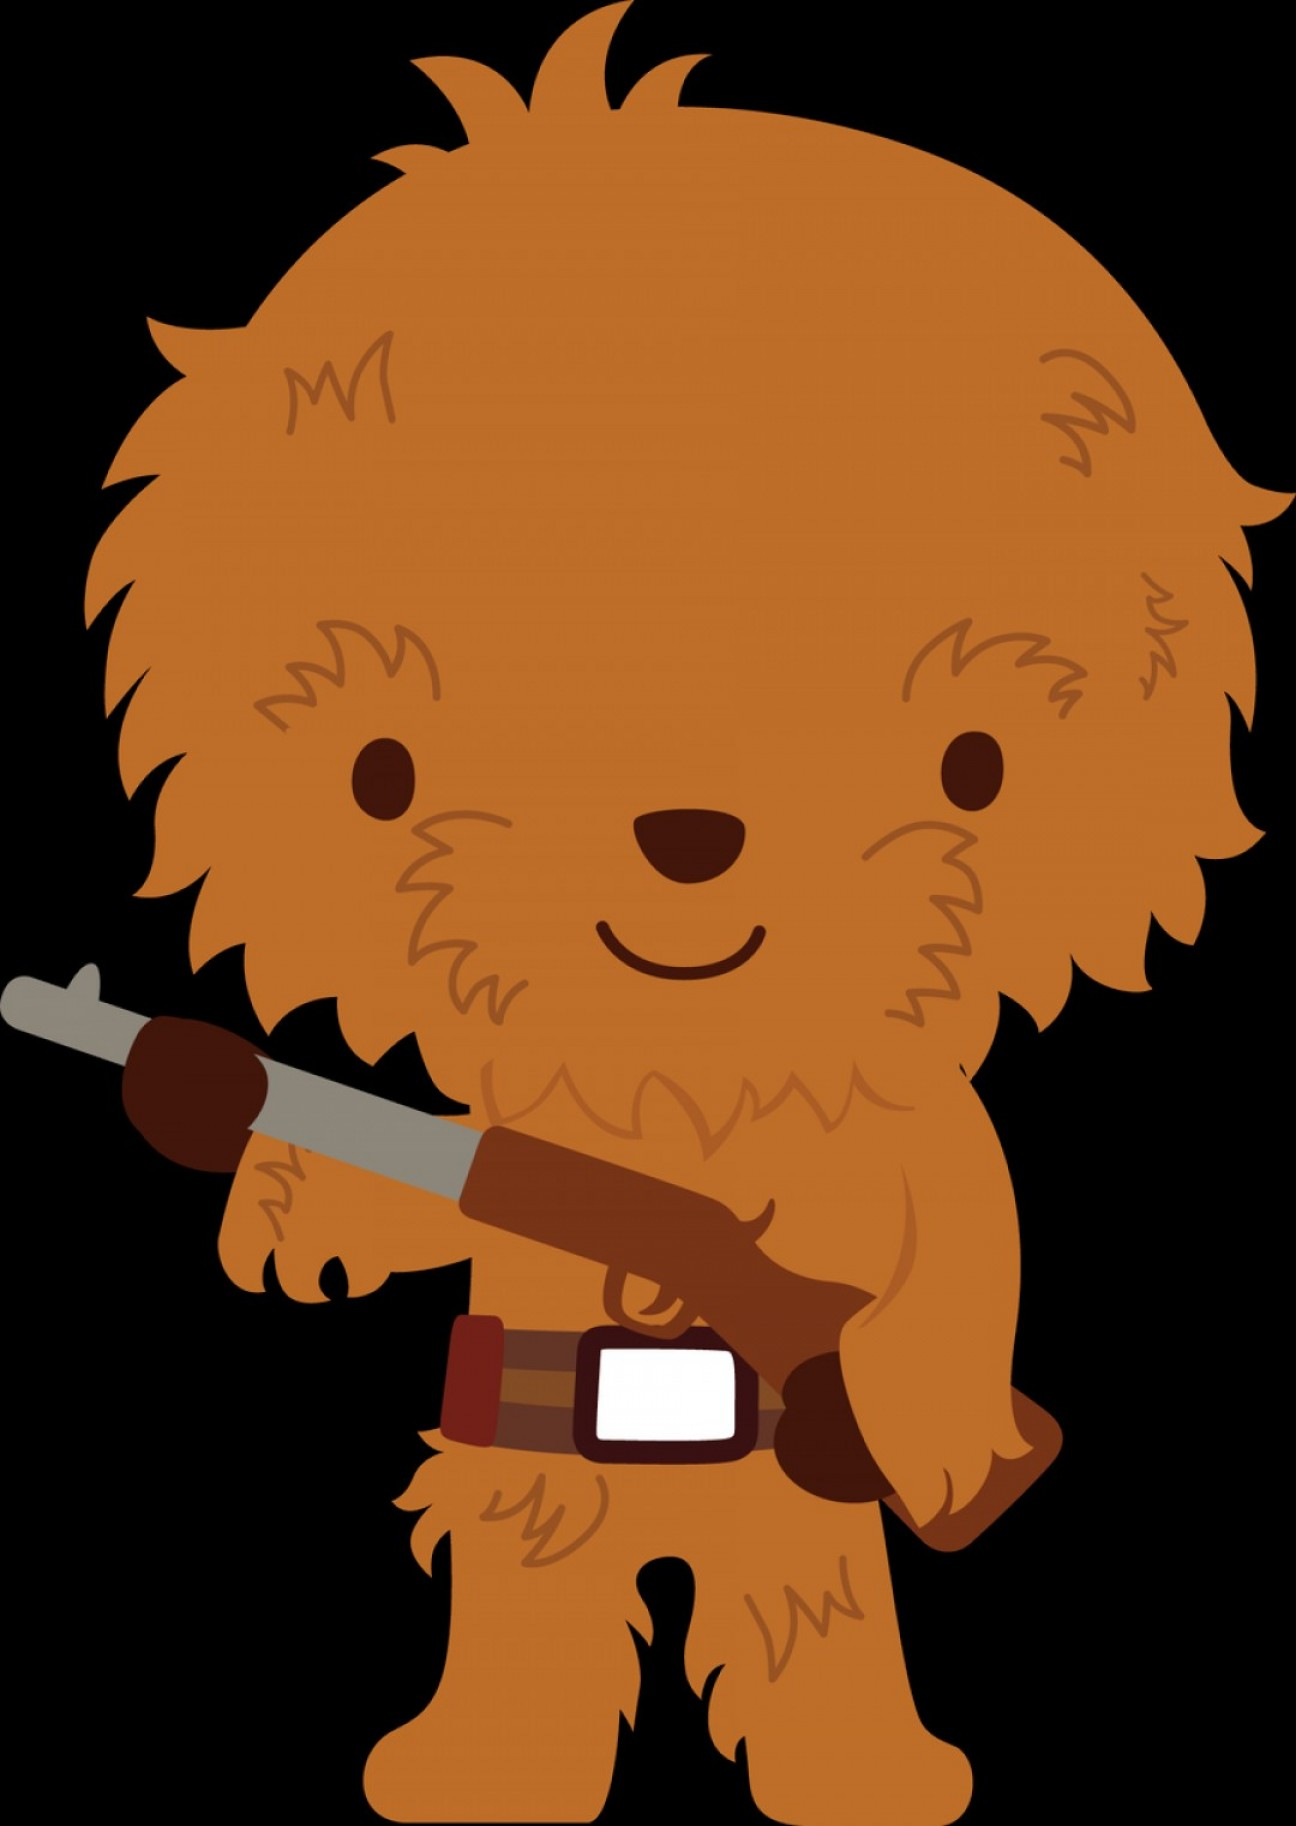 Chewbacca clipart animated. Head vector lamaison